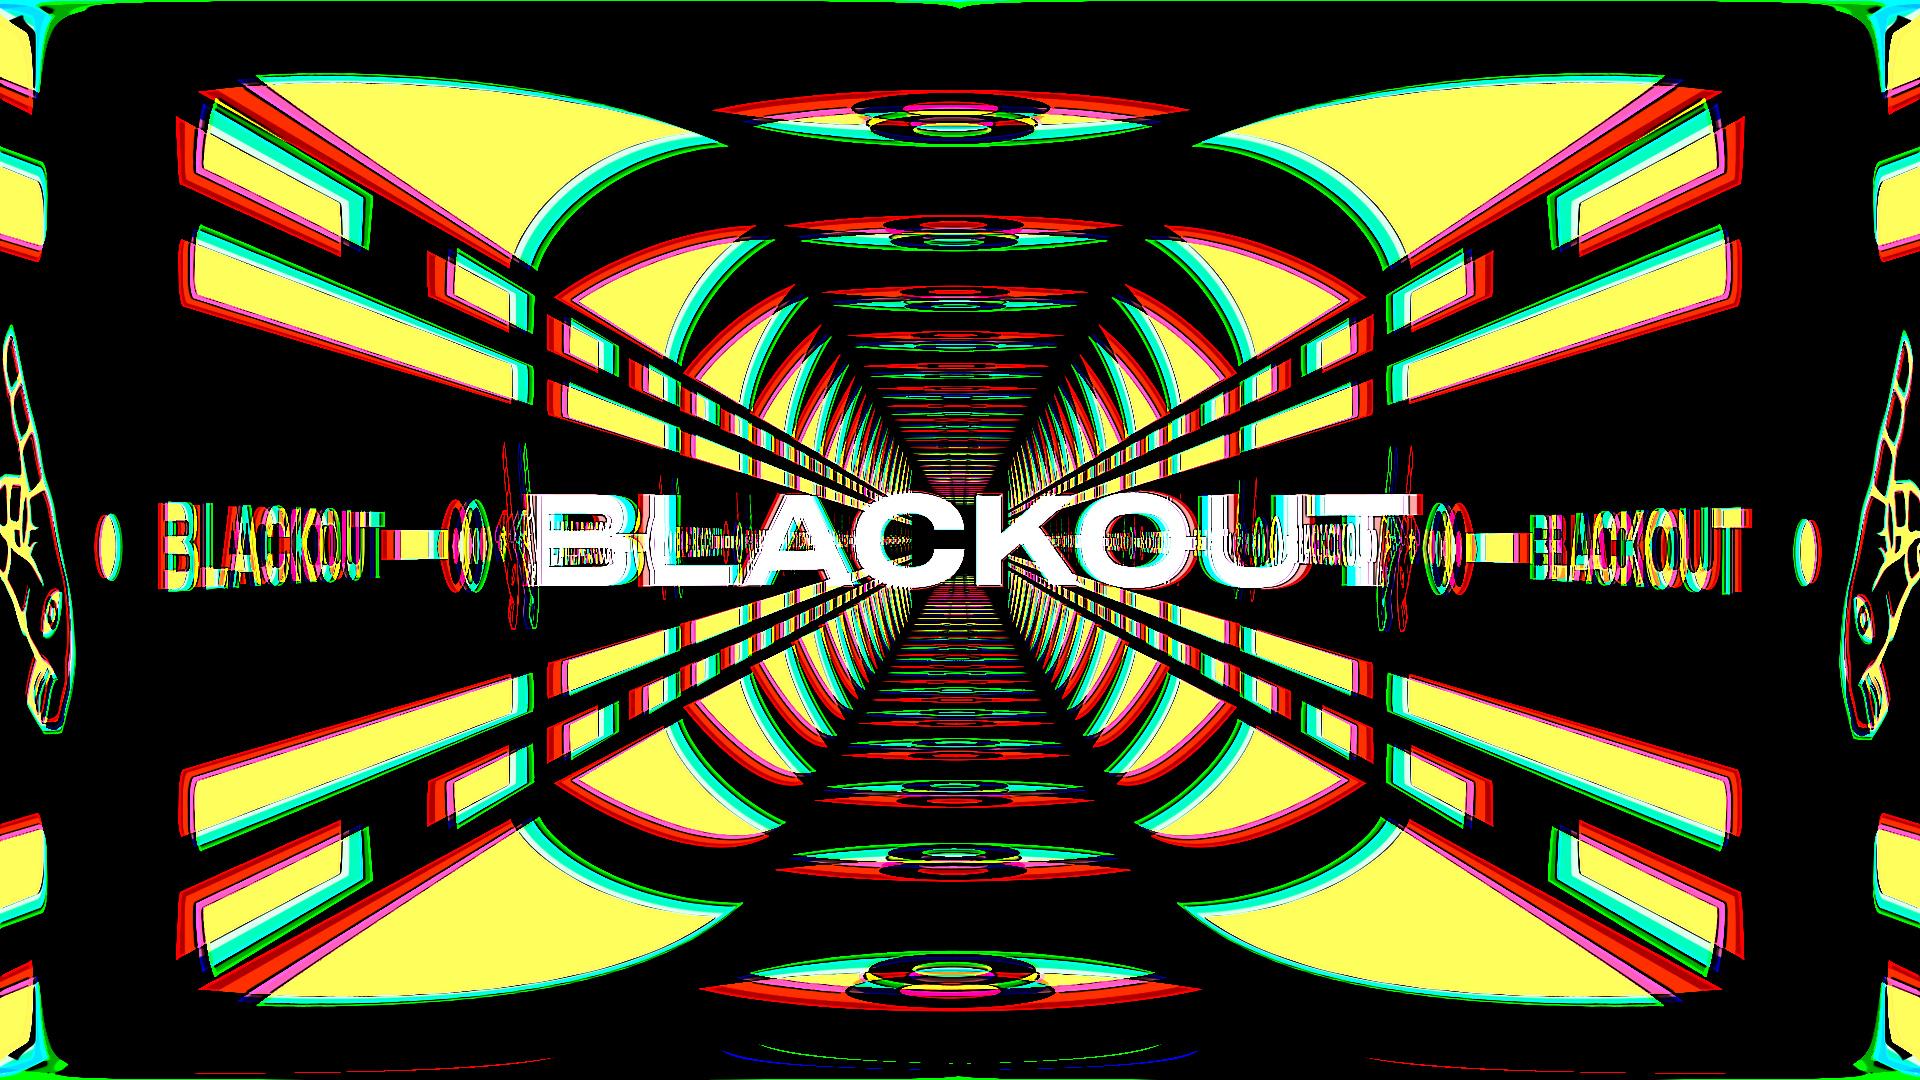 Blackout PEAKS! 02